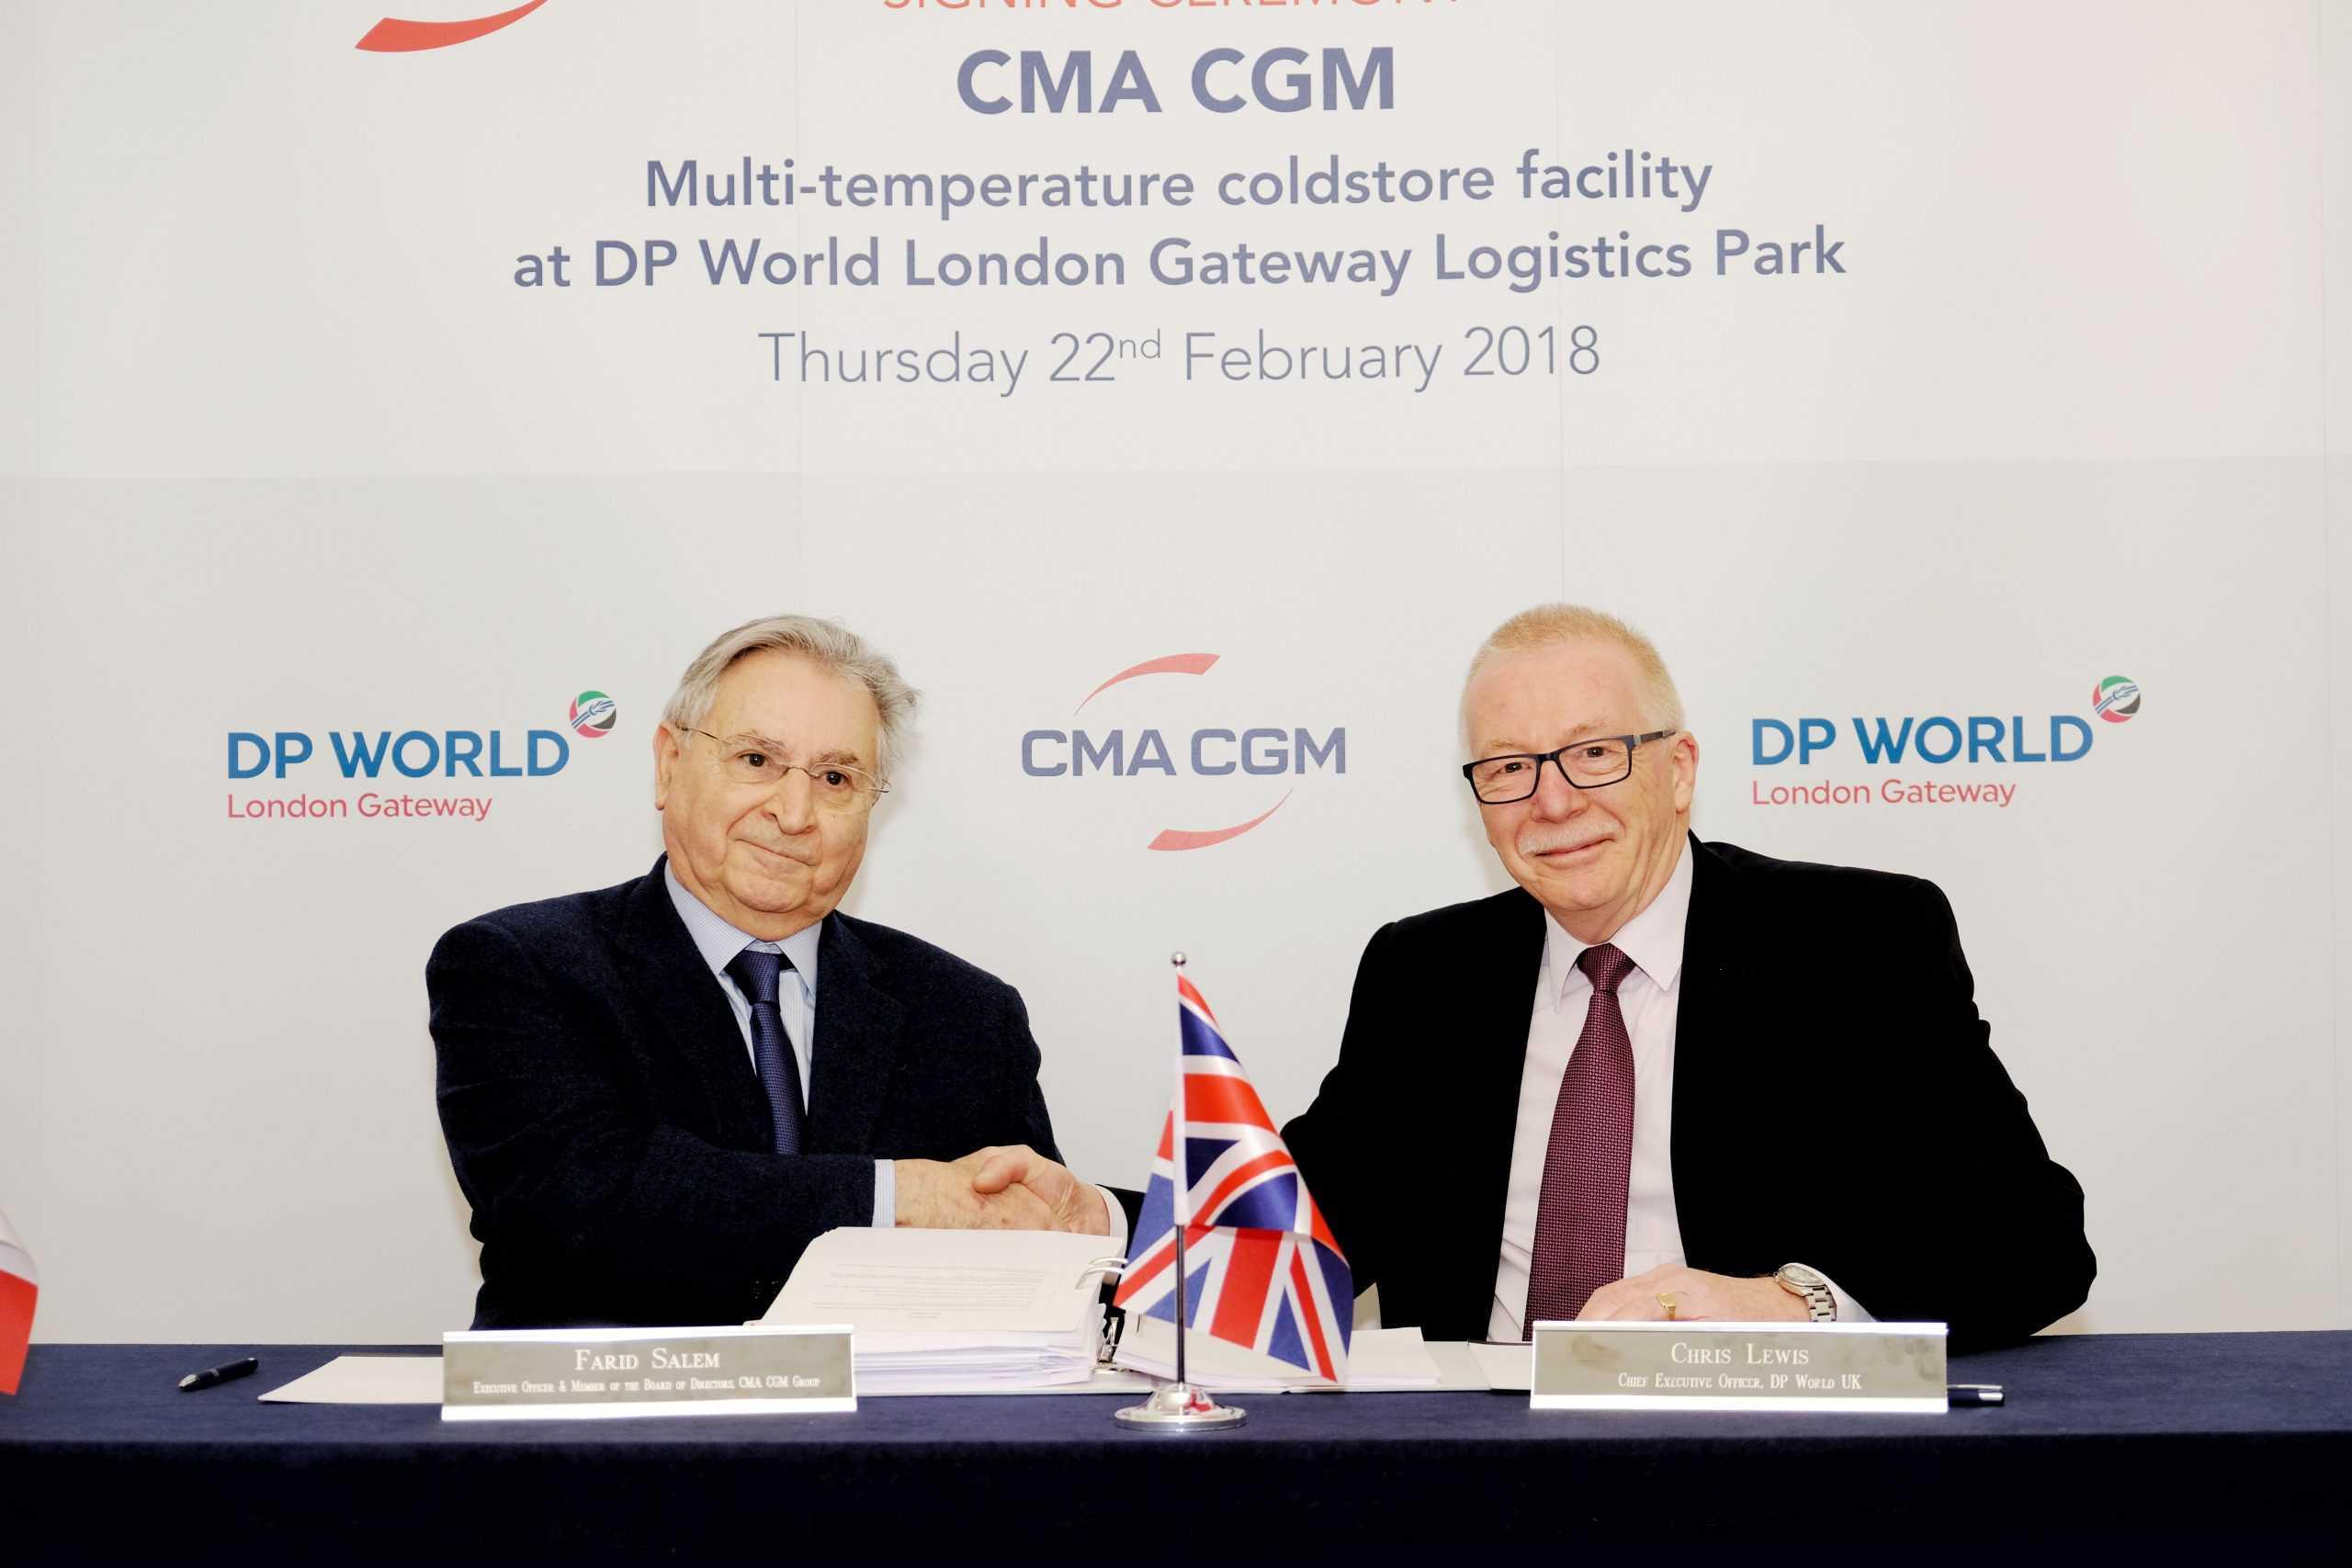 CMA CGM to set up multi-temperaturewarehouse at London Gateway